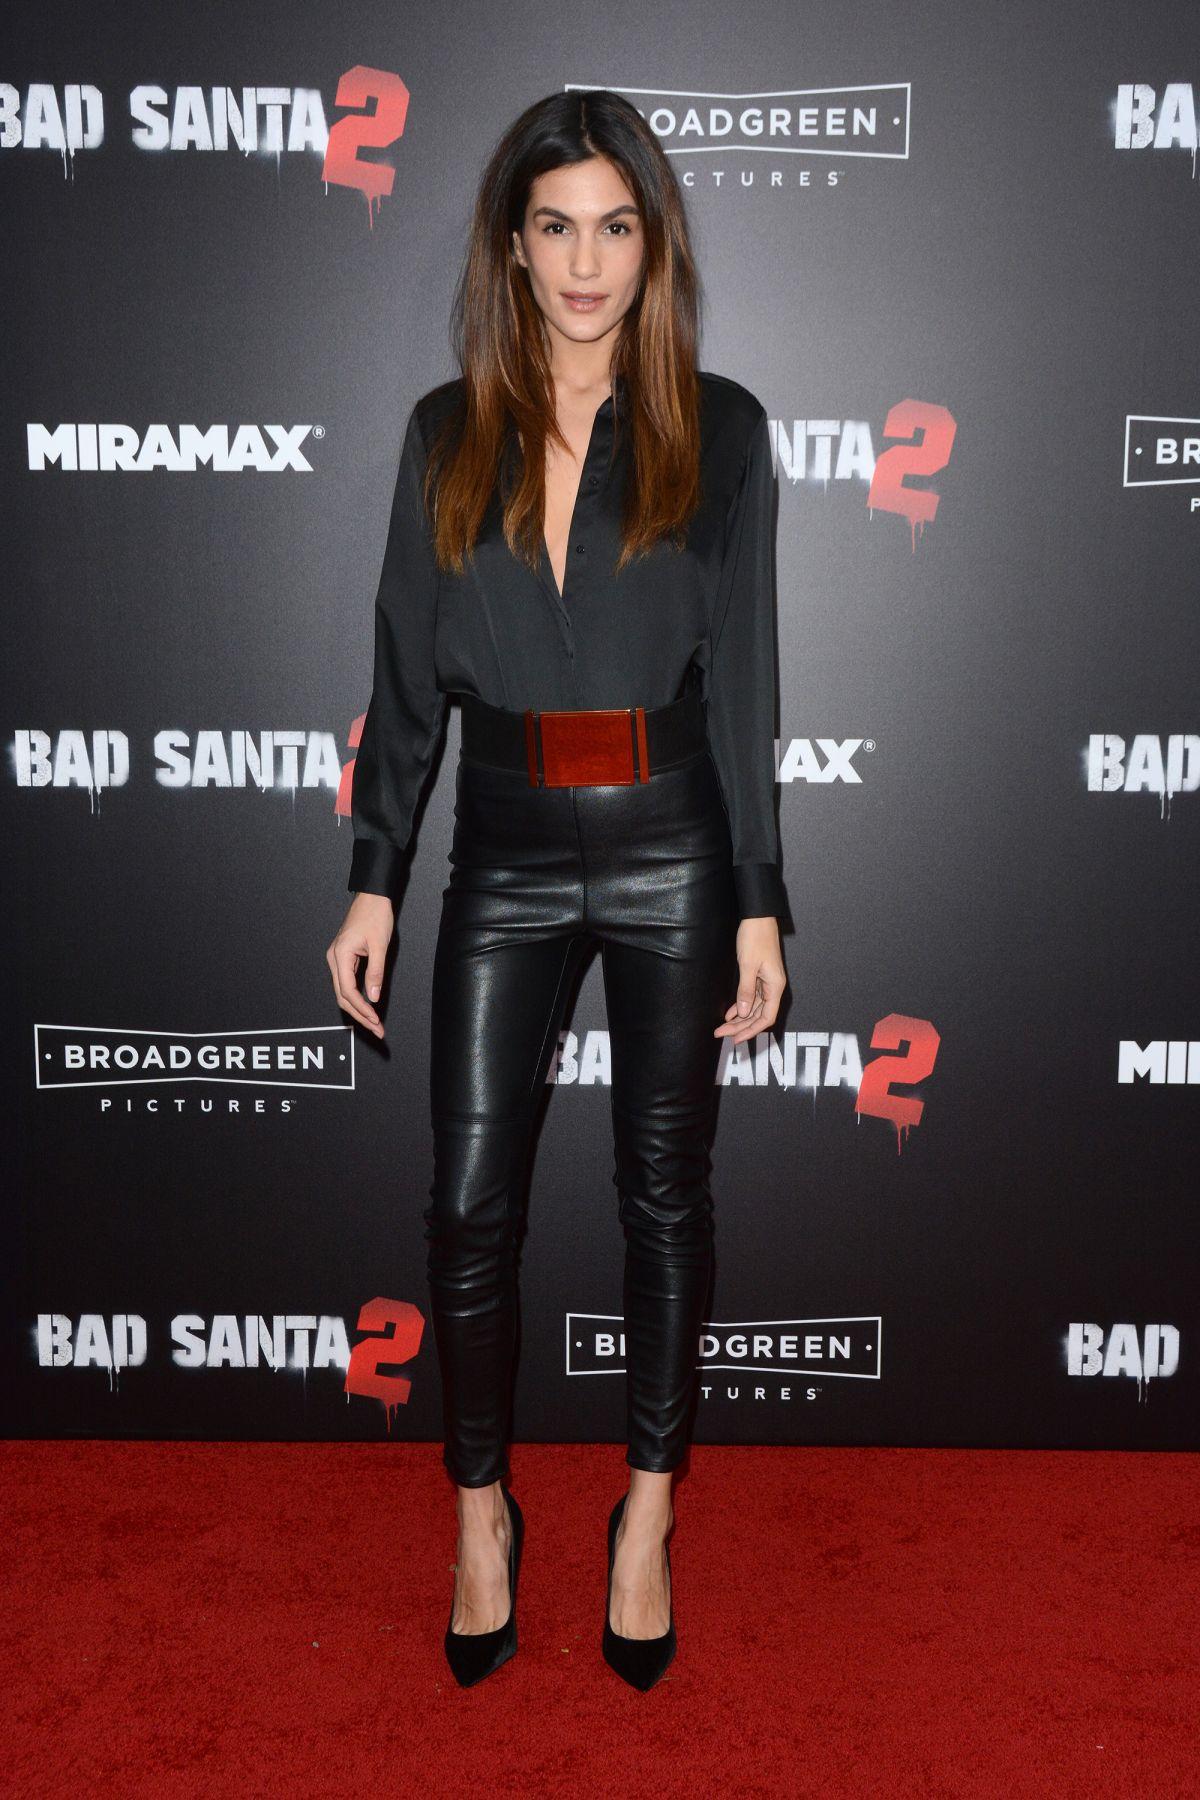 BARBARA NOGUEIRA at 'Bad Santa 2' Premiere in New York 11/15/2016